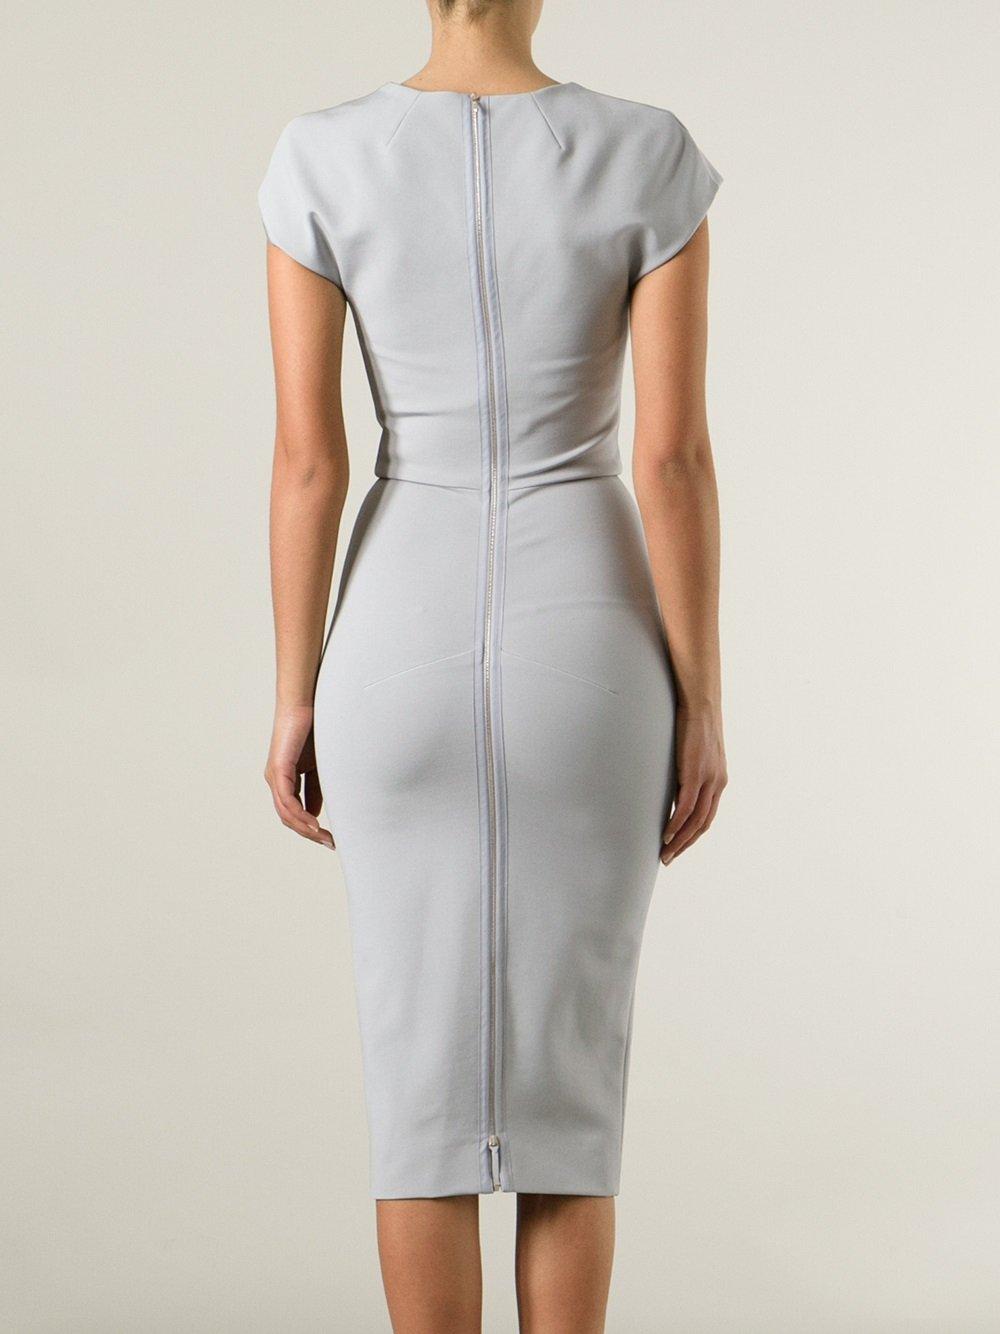 Gray Pencil Dress